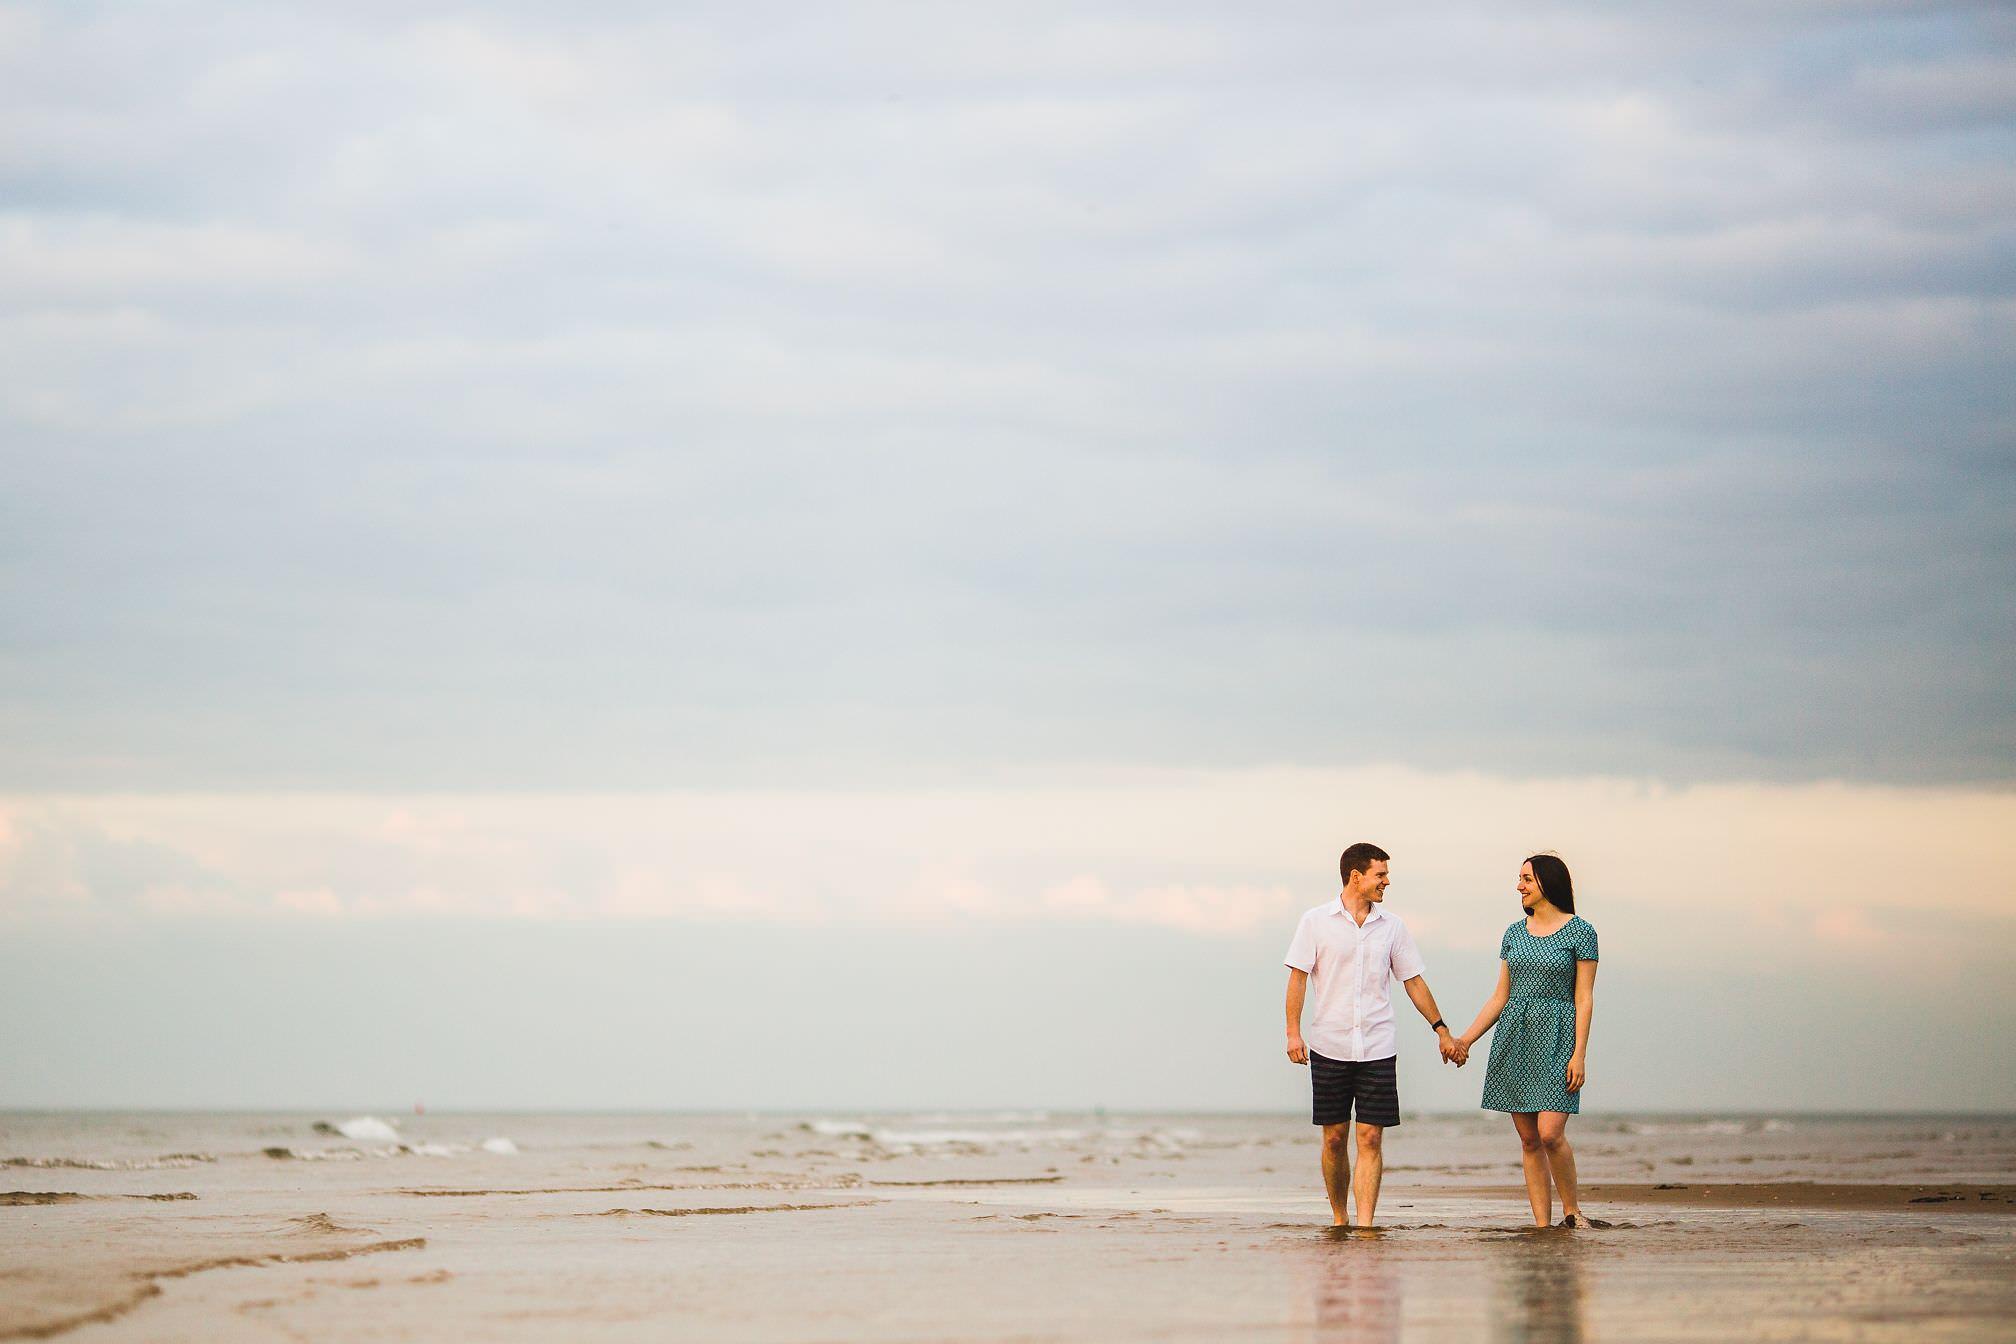 Walking in the sea, Wells-next-the-Sea